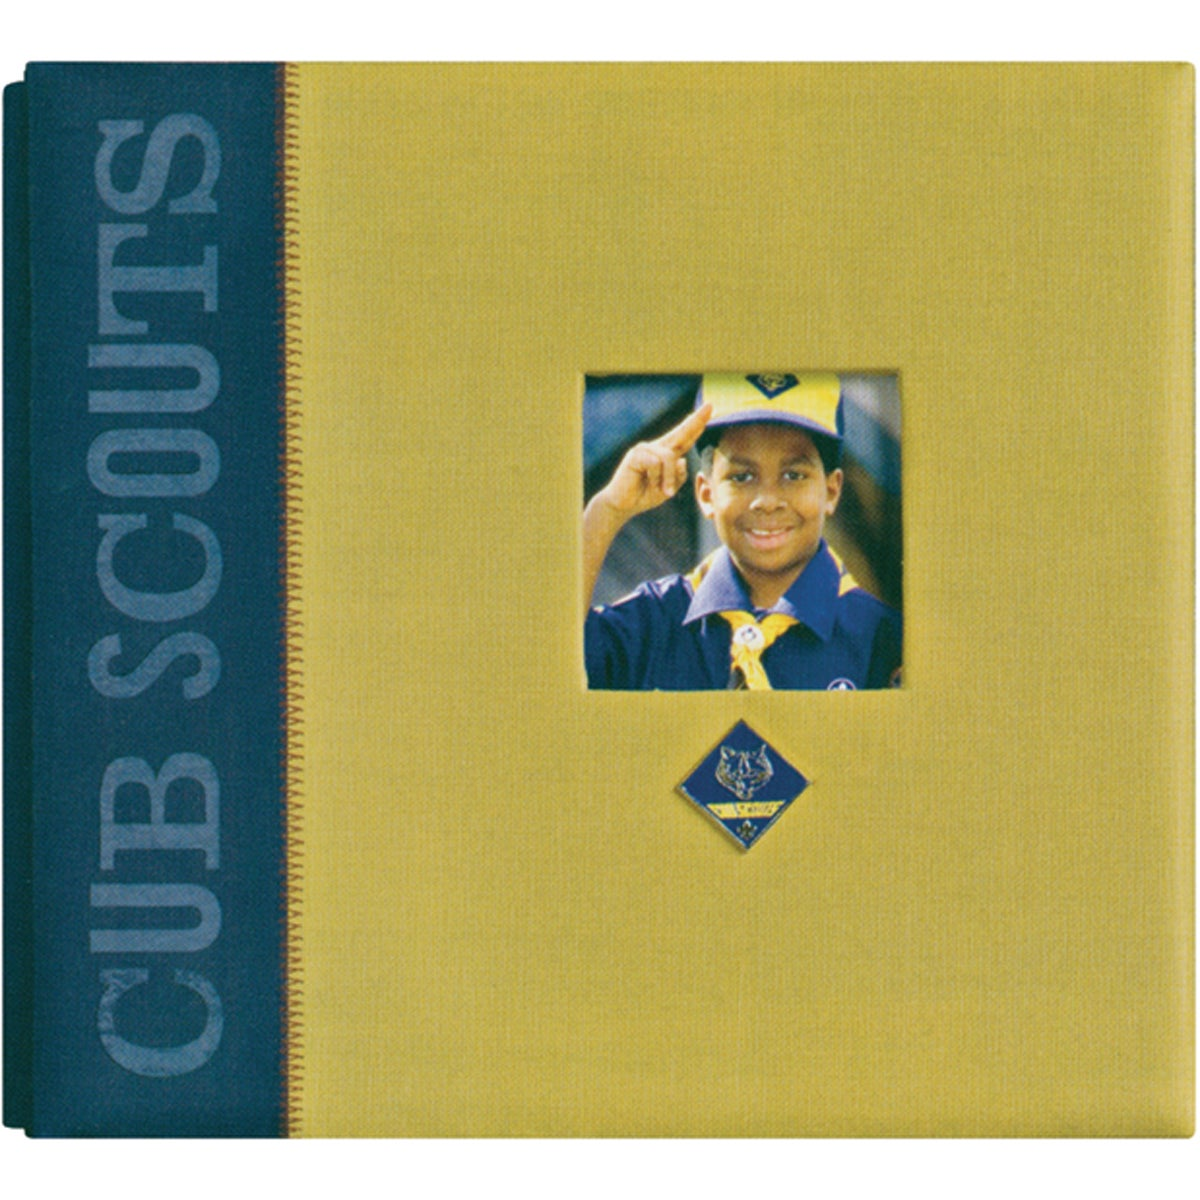 Classic Post-bound Cub Scouts Twill Scrapbook Album with Metal Emblem